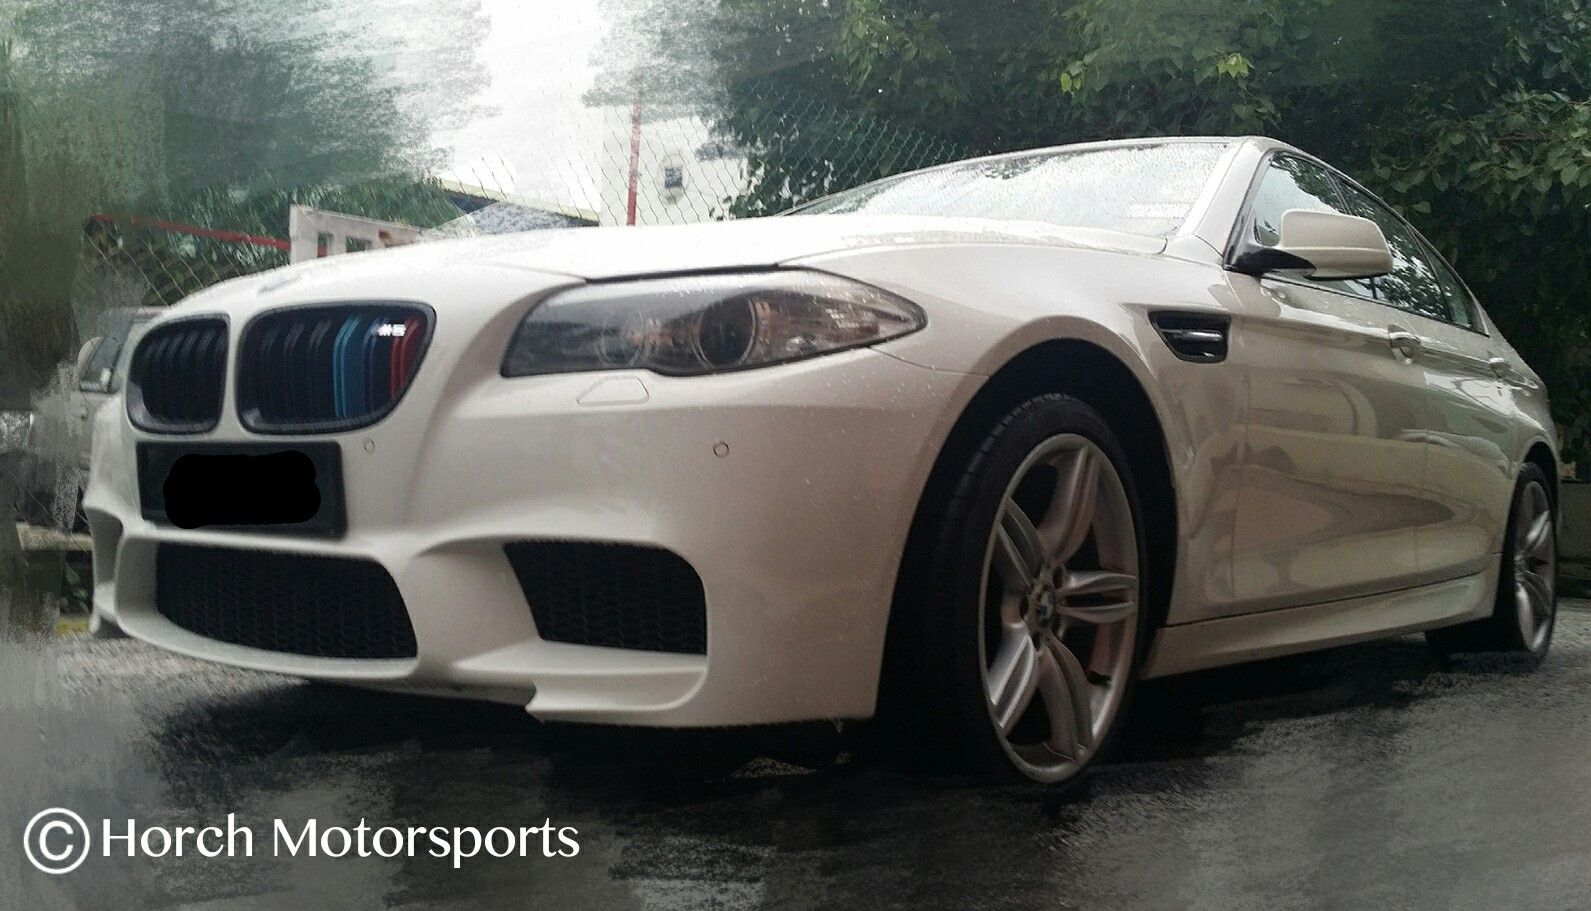 59bdbdb610a BMW F10 convert M5 bodykit   Horch Motorsports 017-210 5779 MPerformance   MPower  MSport  HorchMotorsports